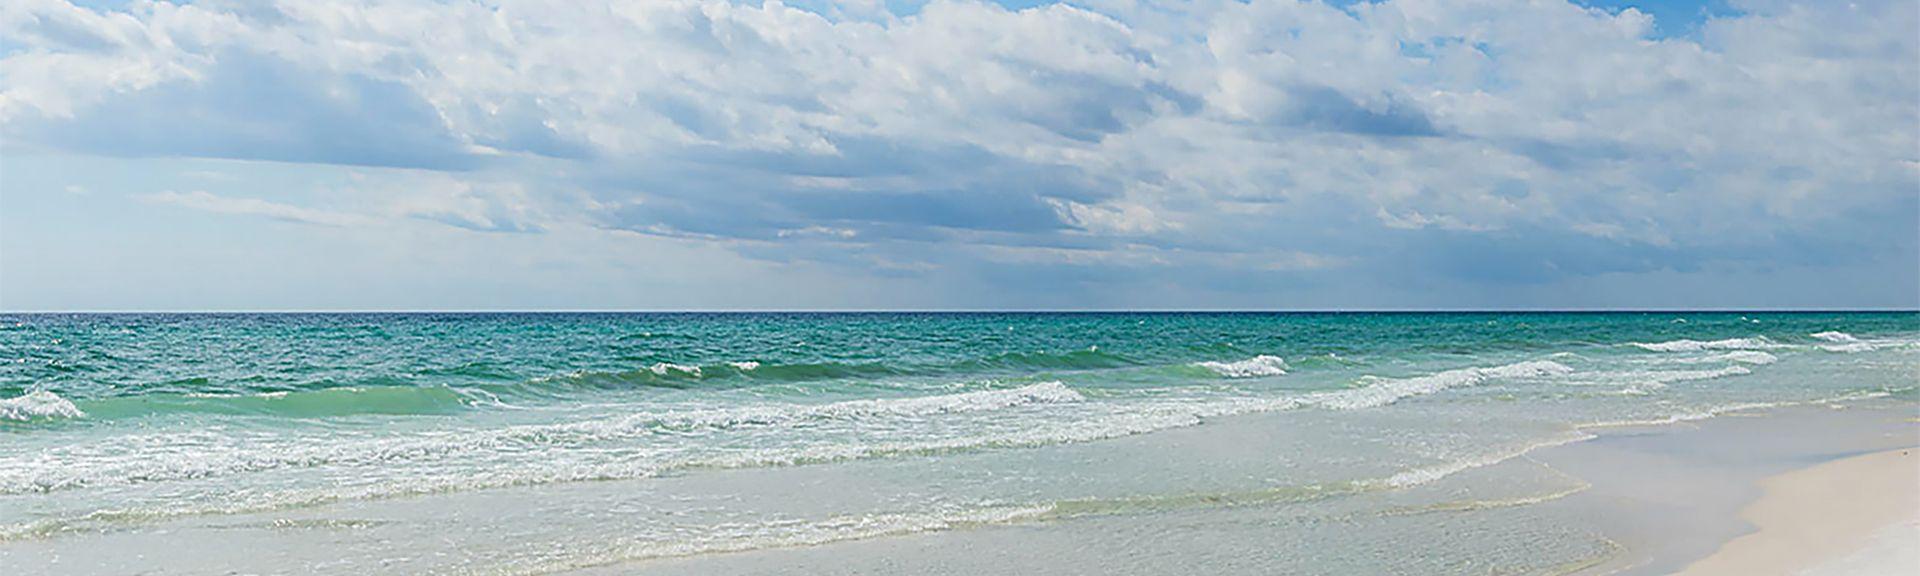 Gulf Place Cabanas, Santa Rosa Beach, FL, USA